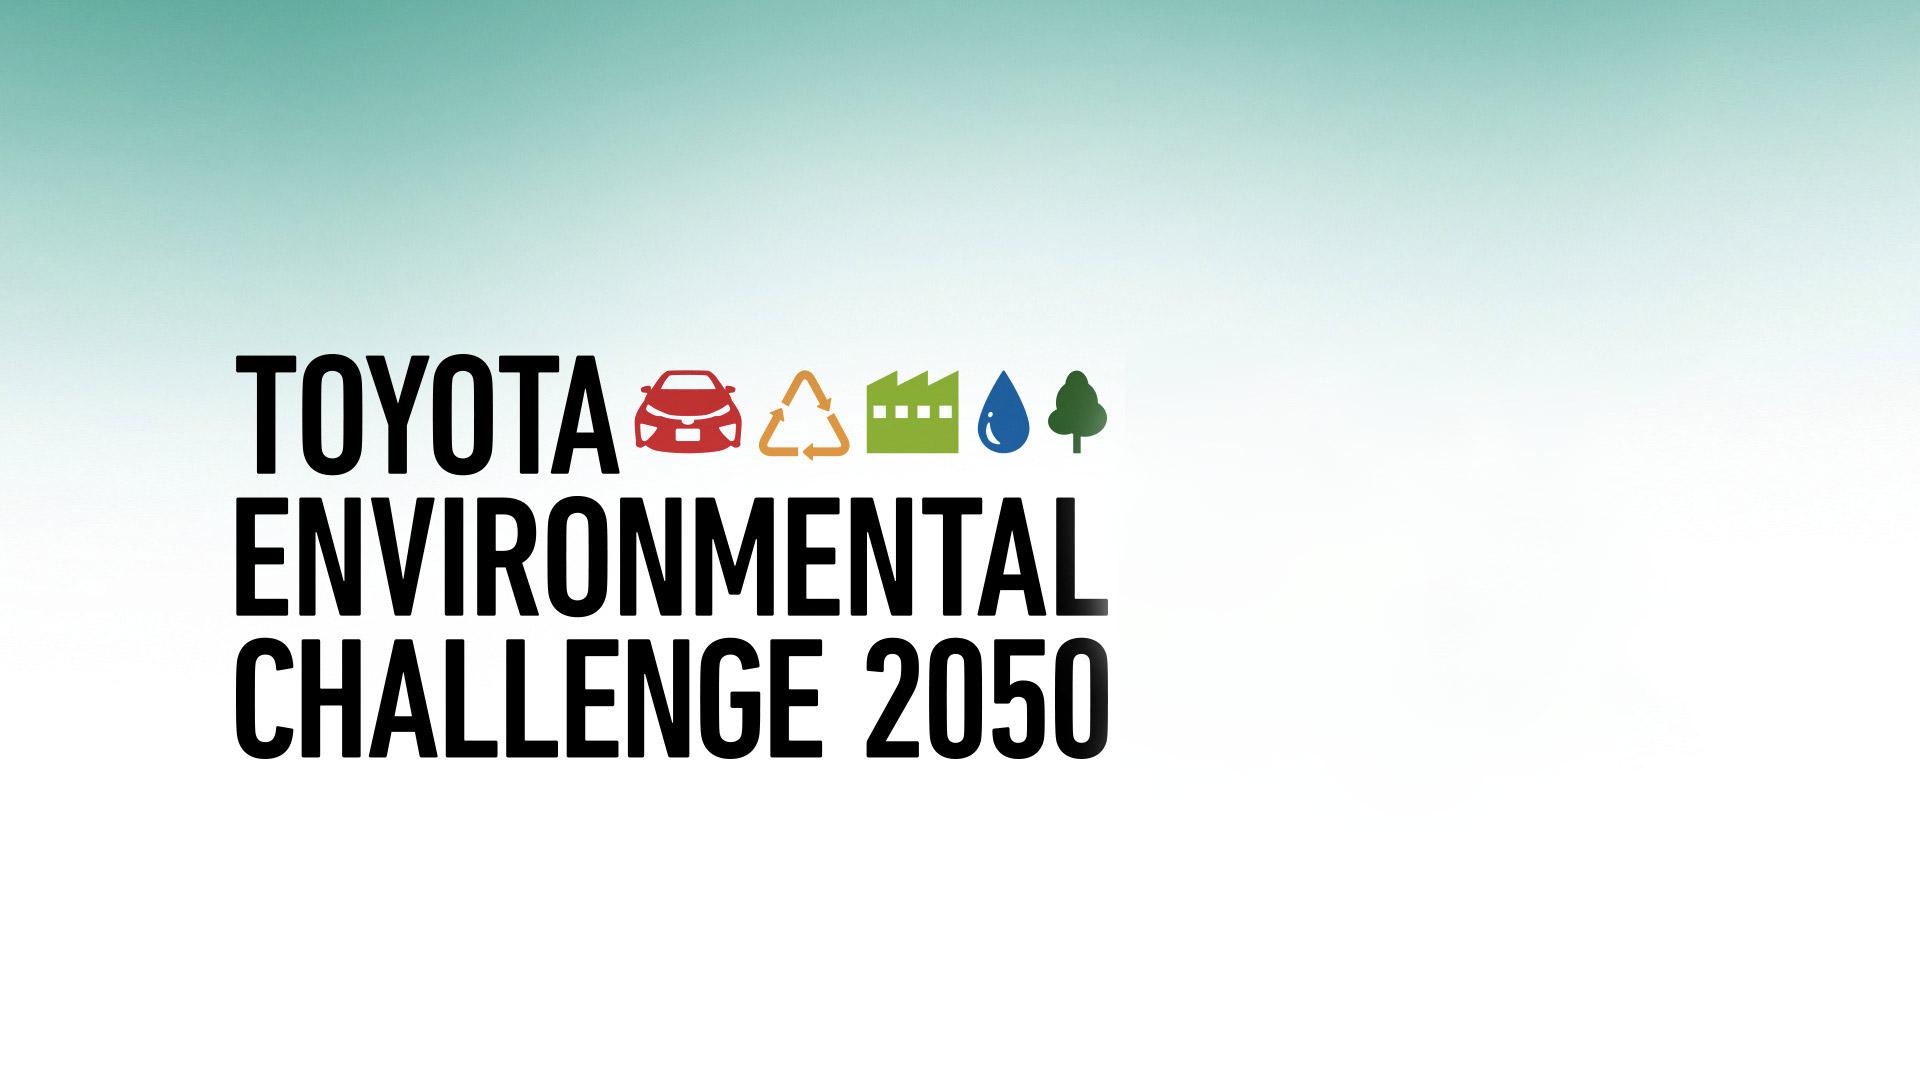 Environmental Challenge 2050